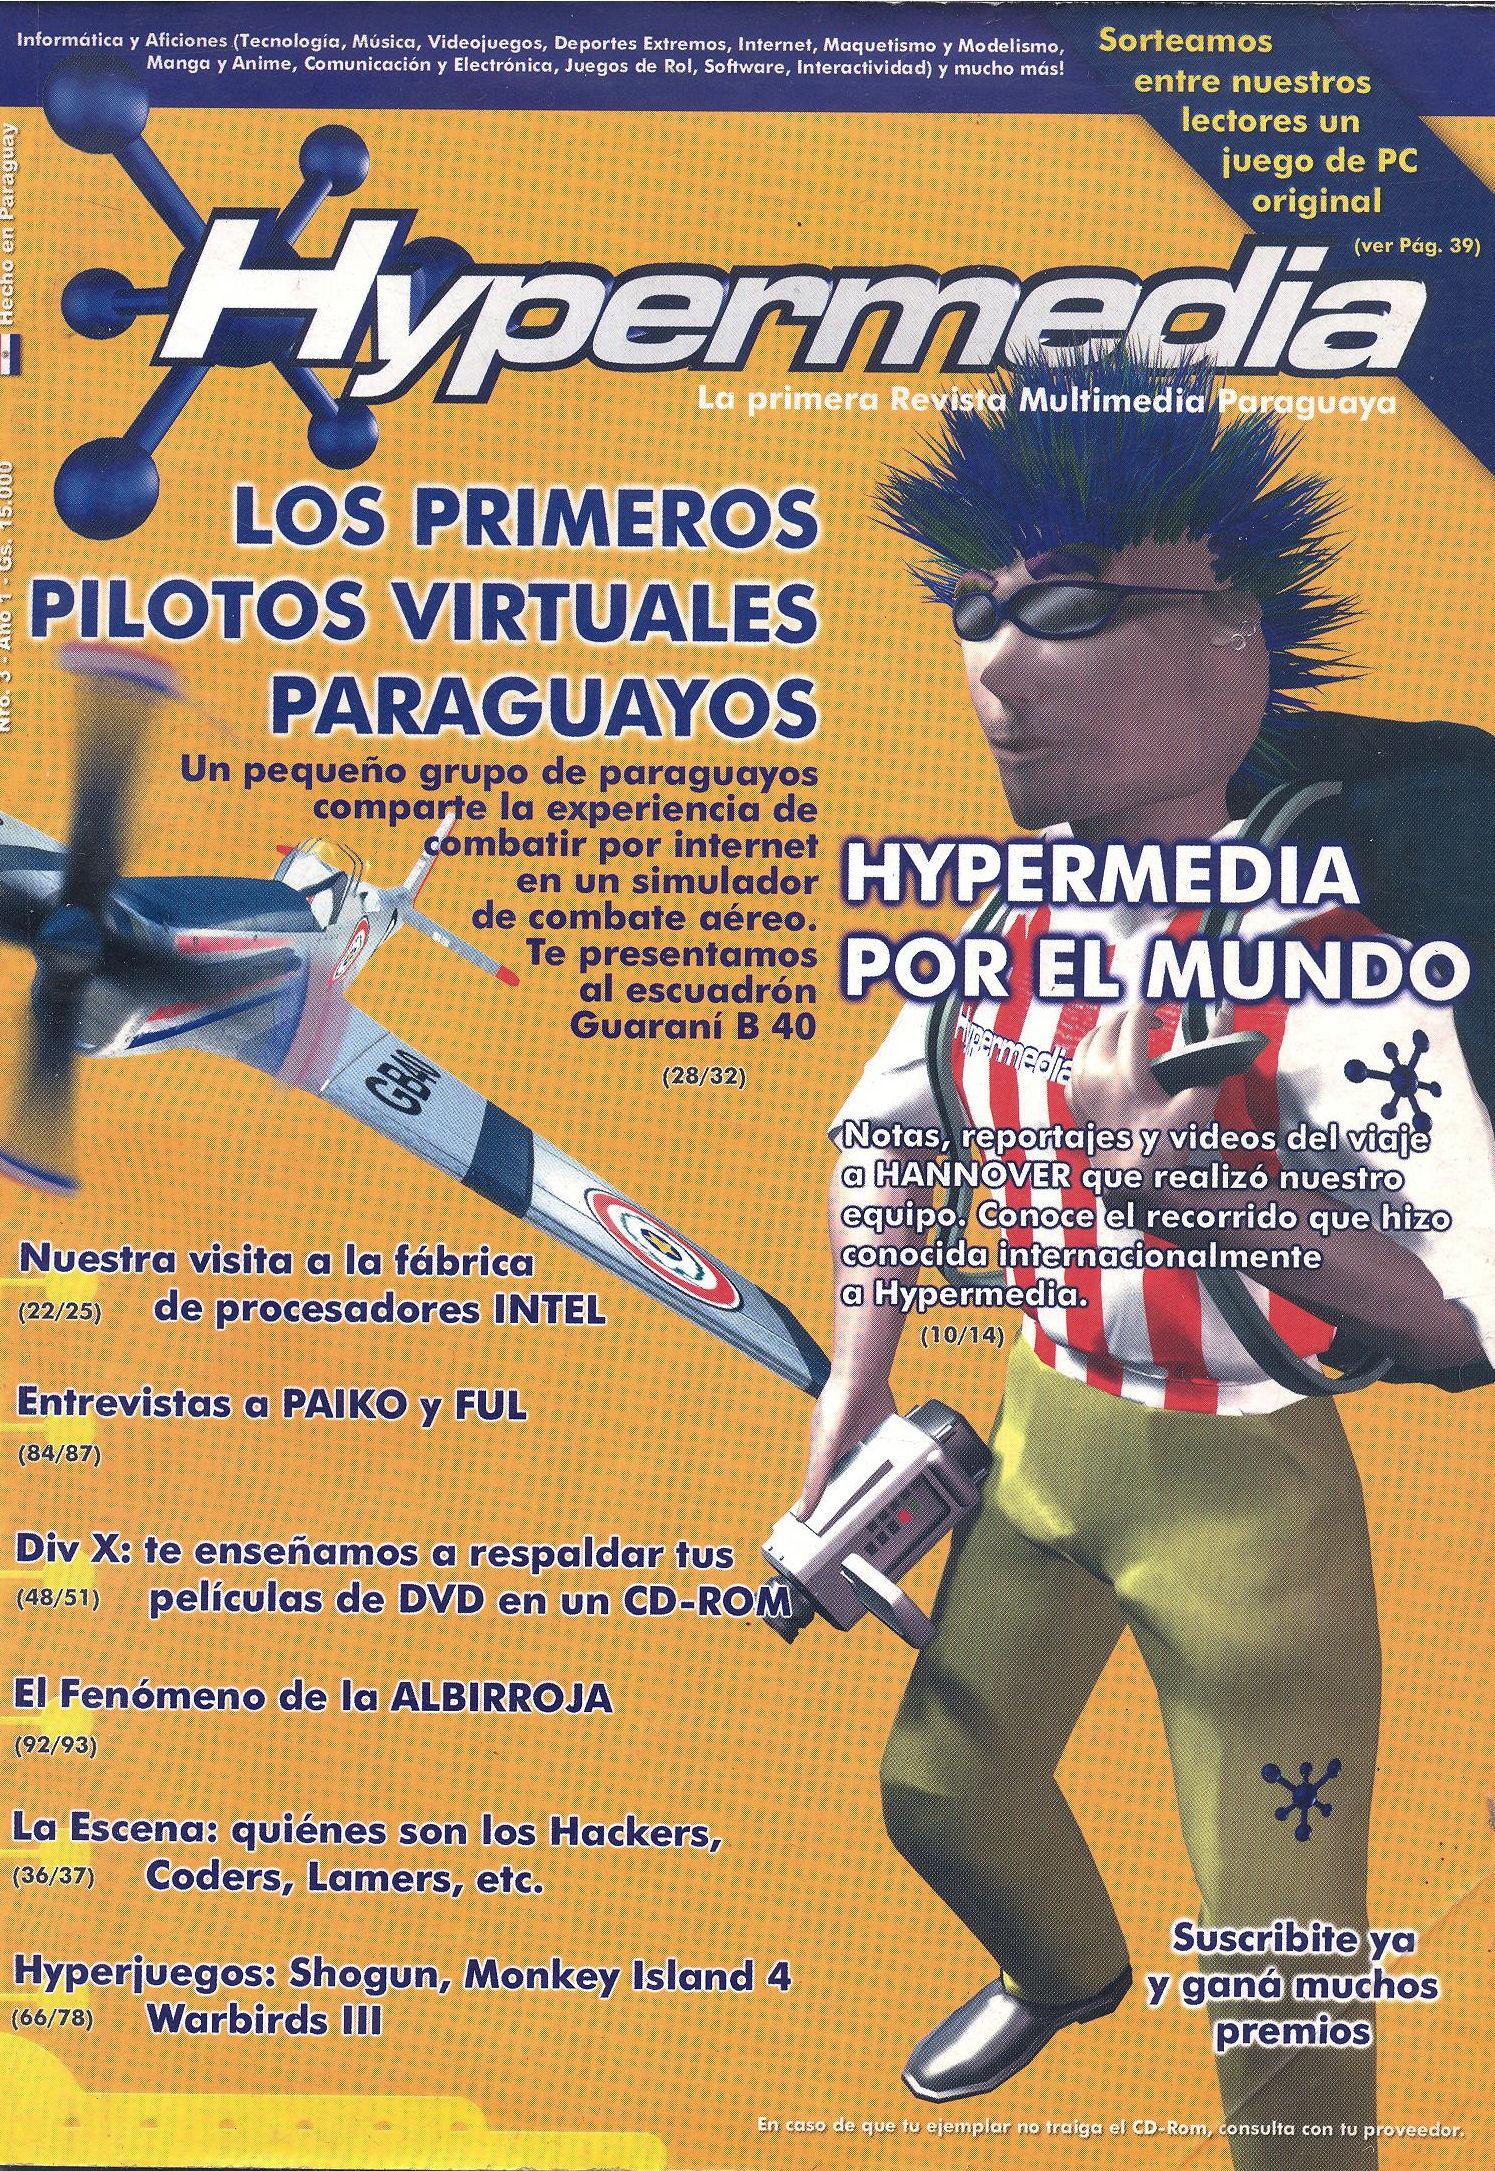 2001 Hypermedia 3